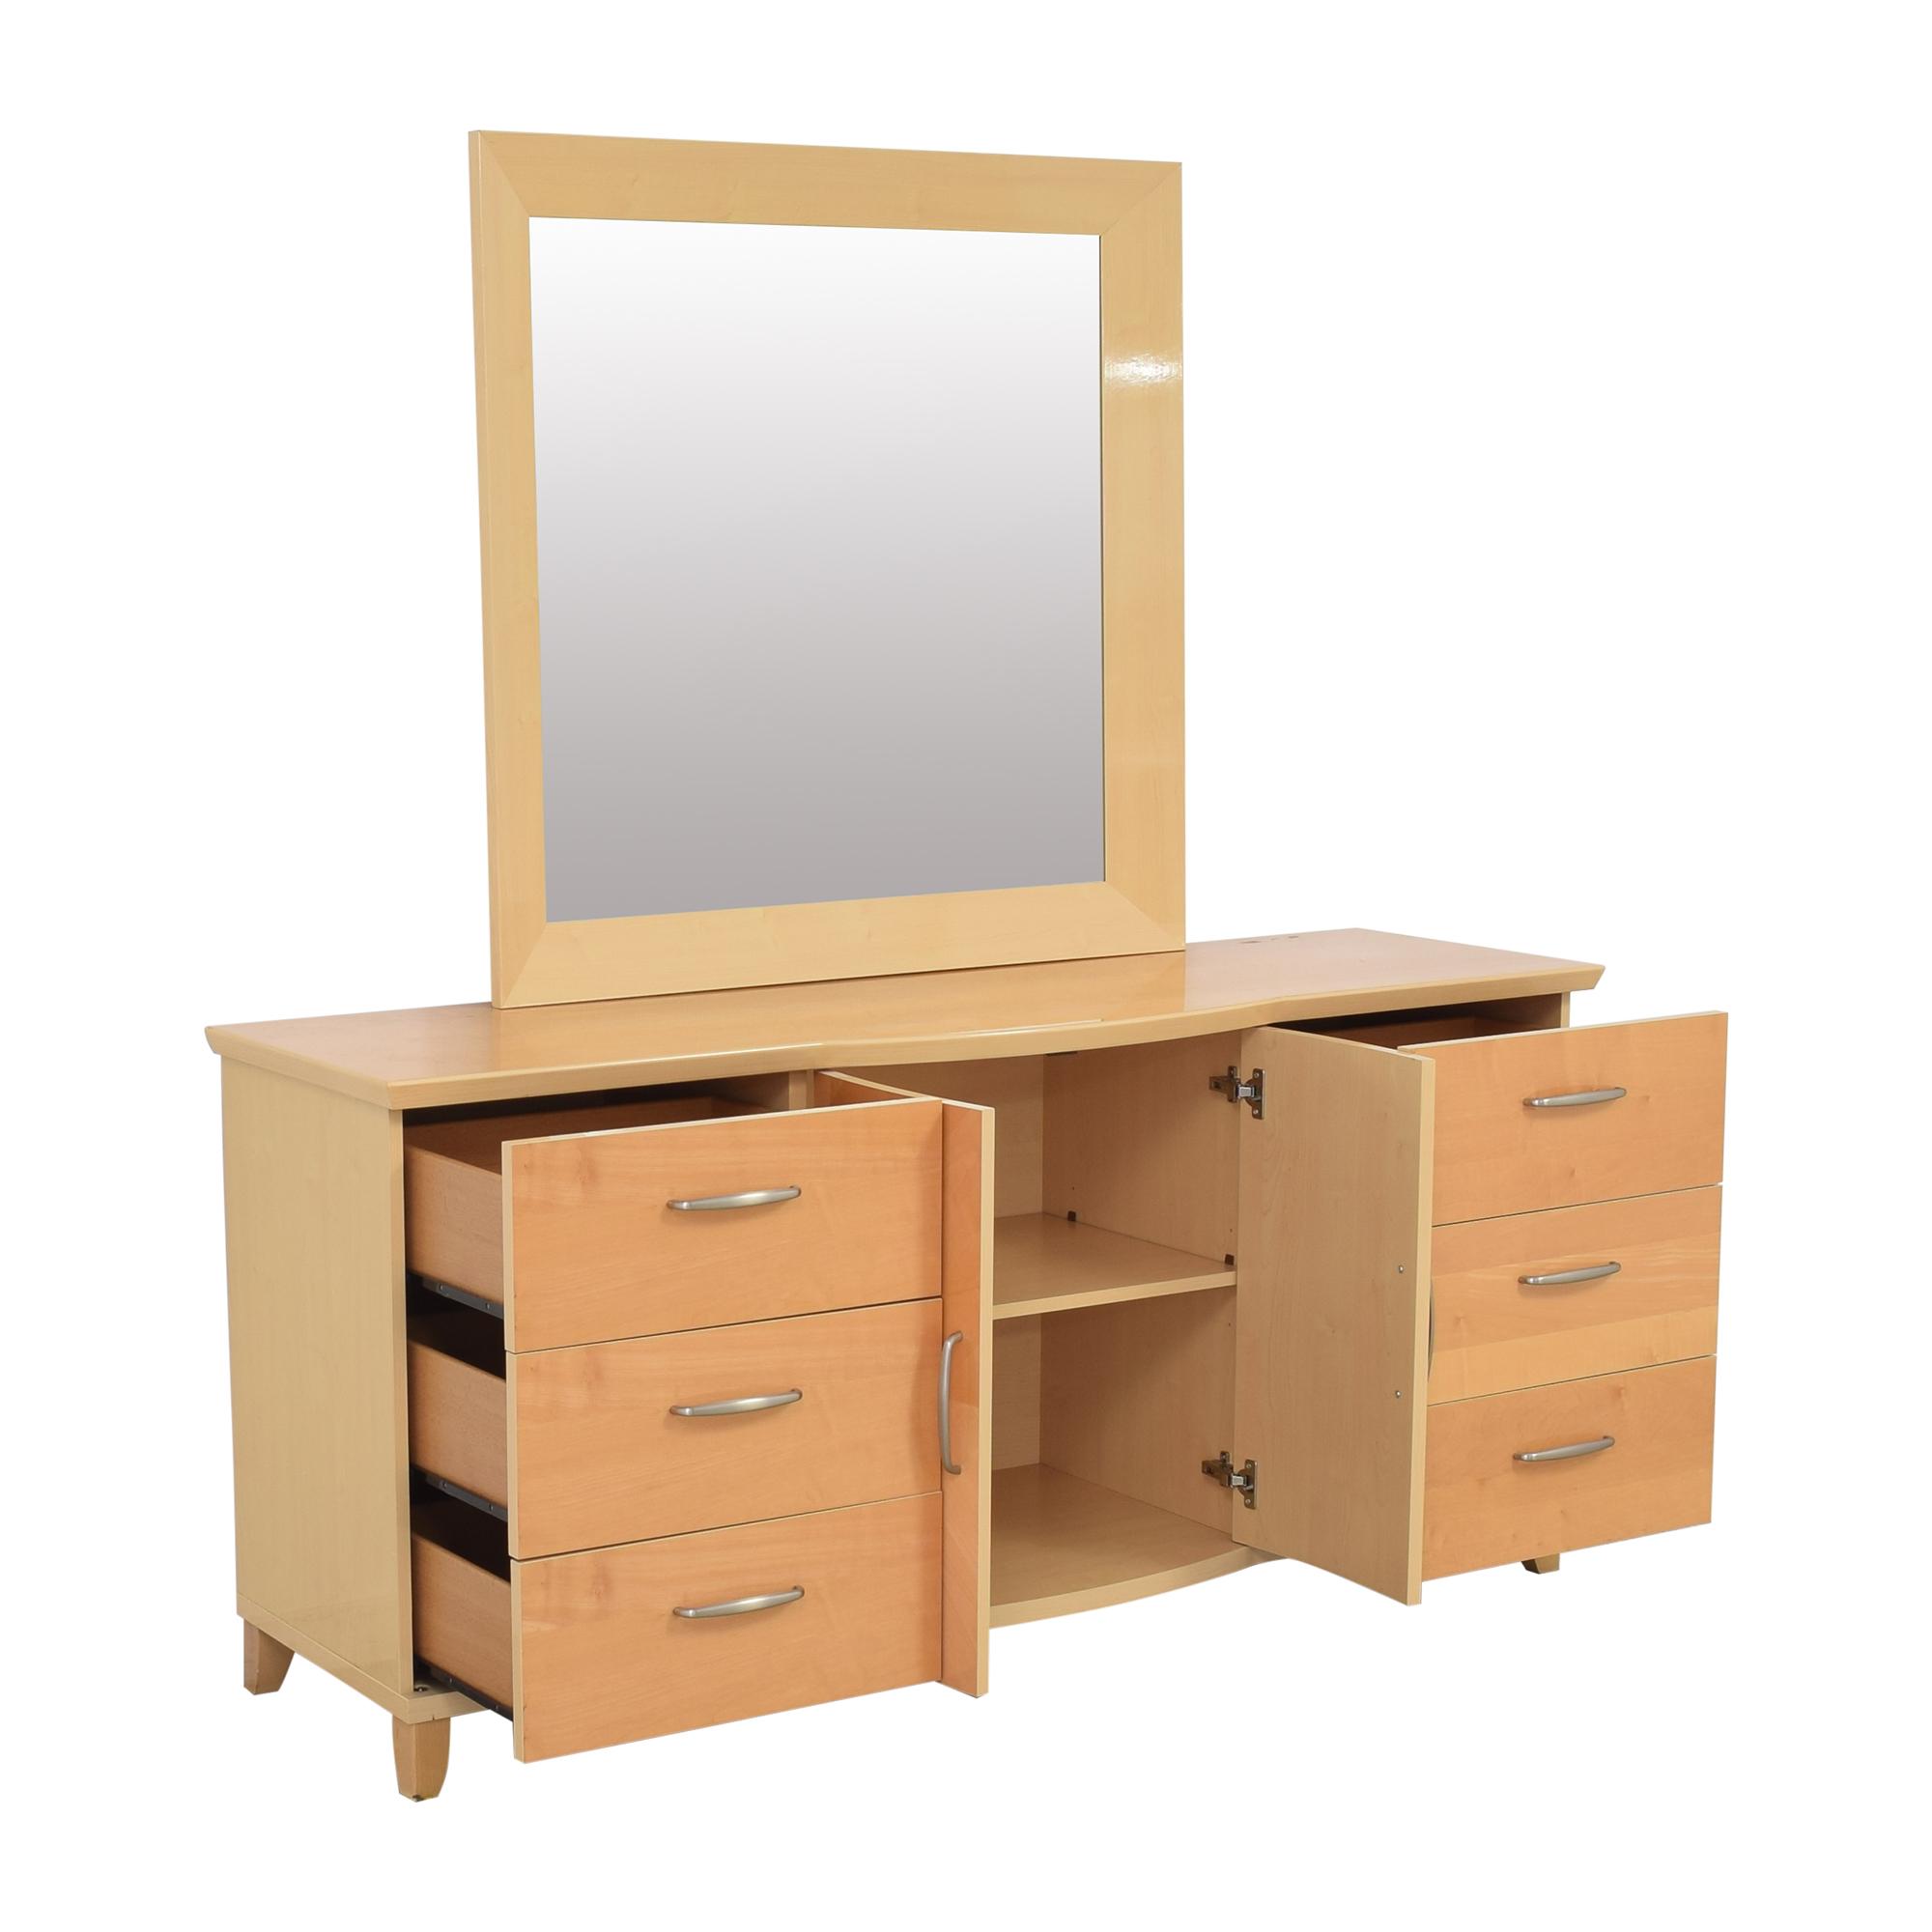 Planum Planum Modern Style Dresser and Mirror light brown